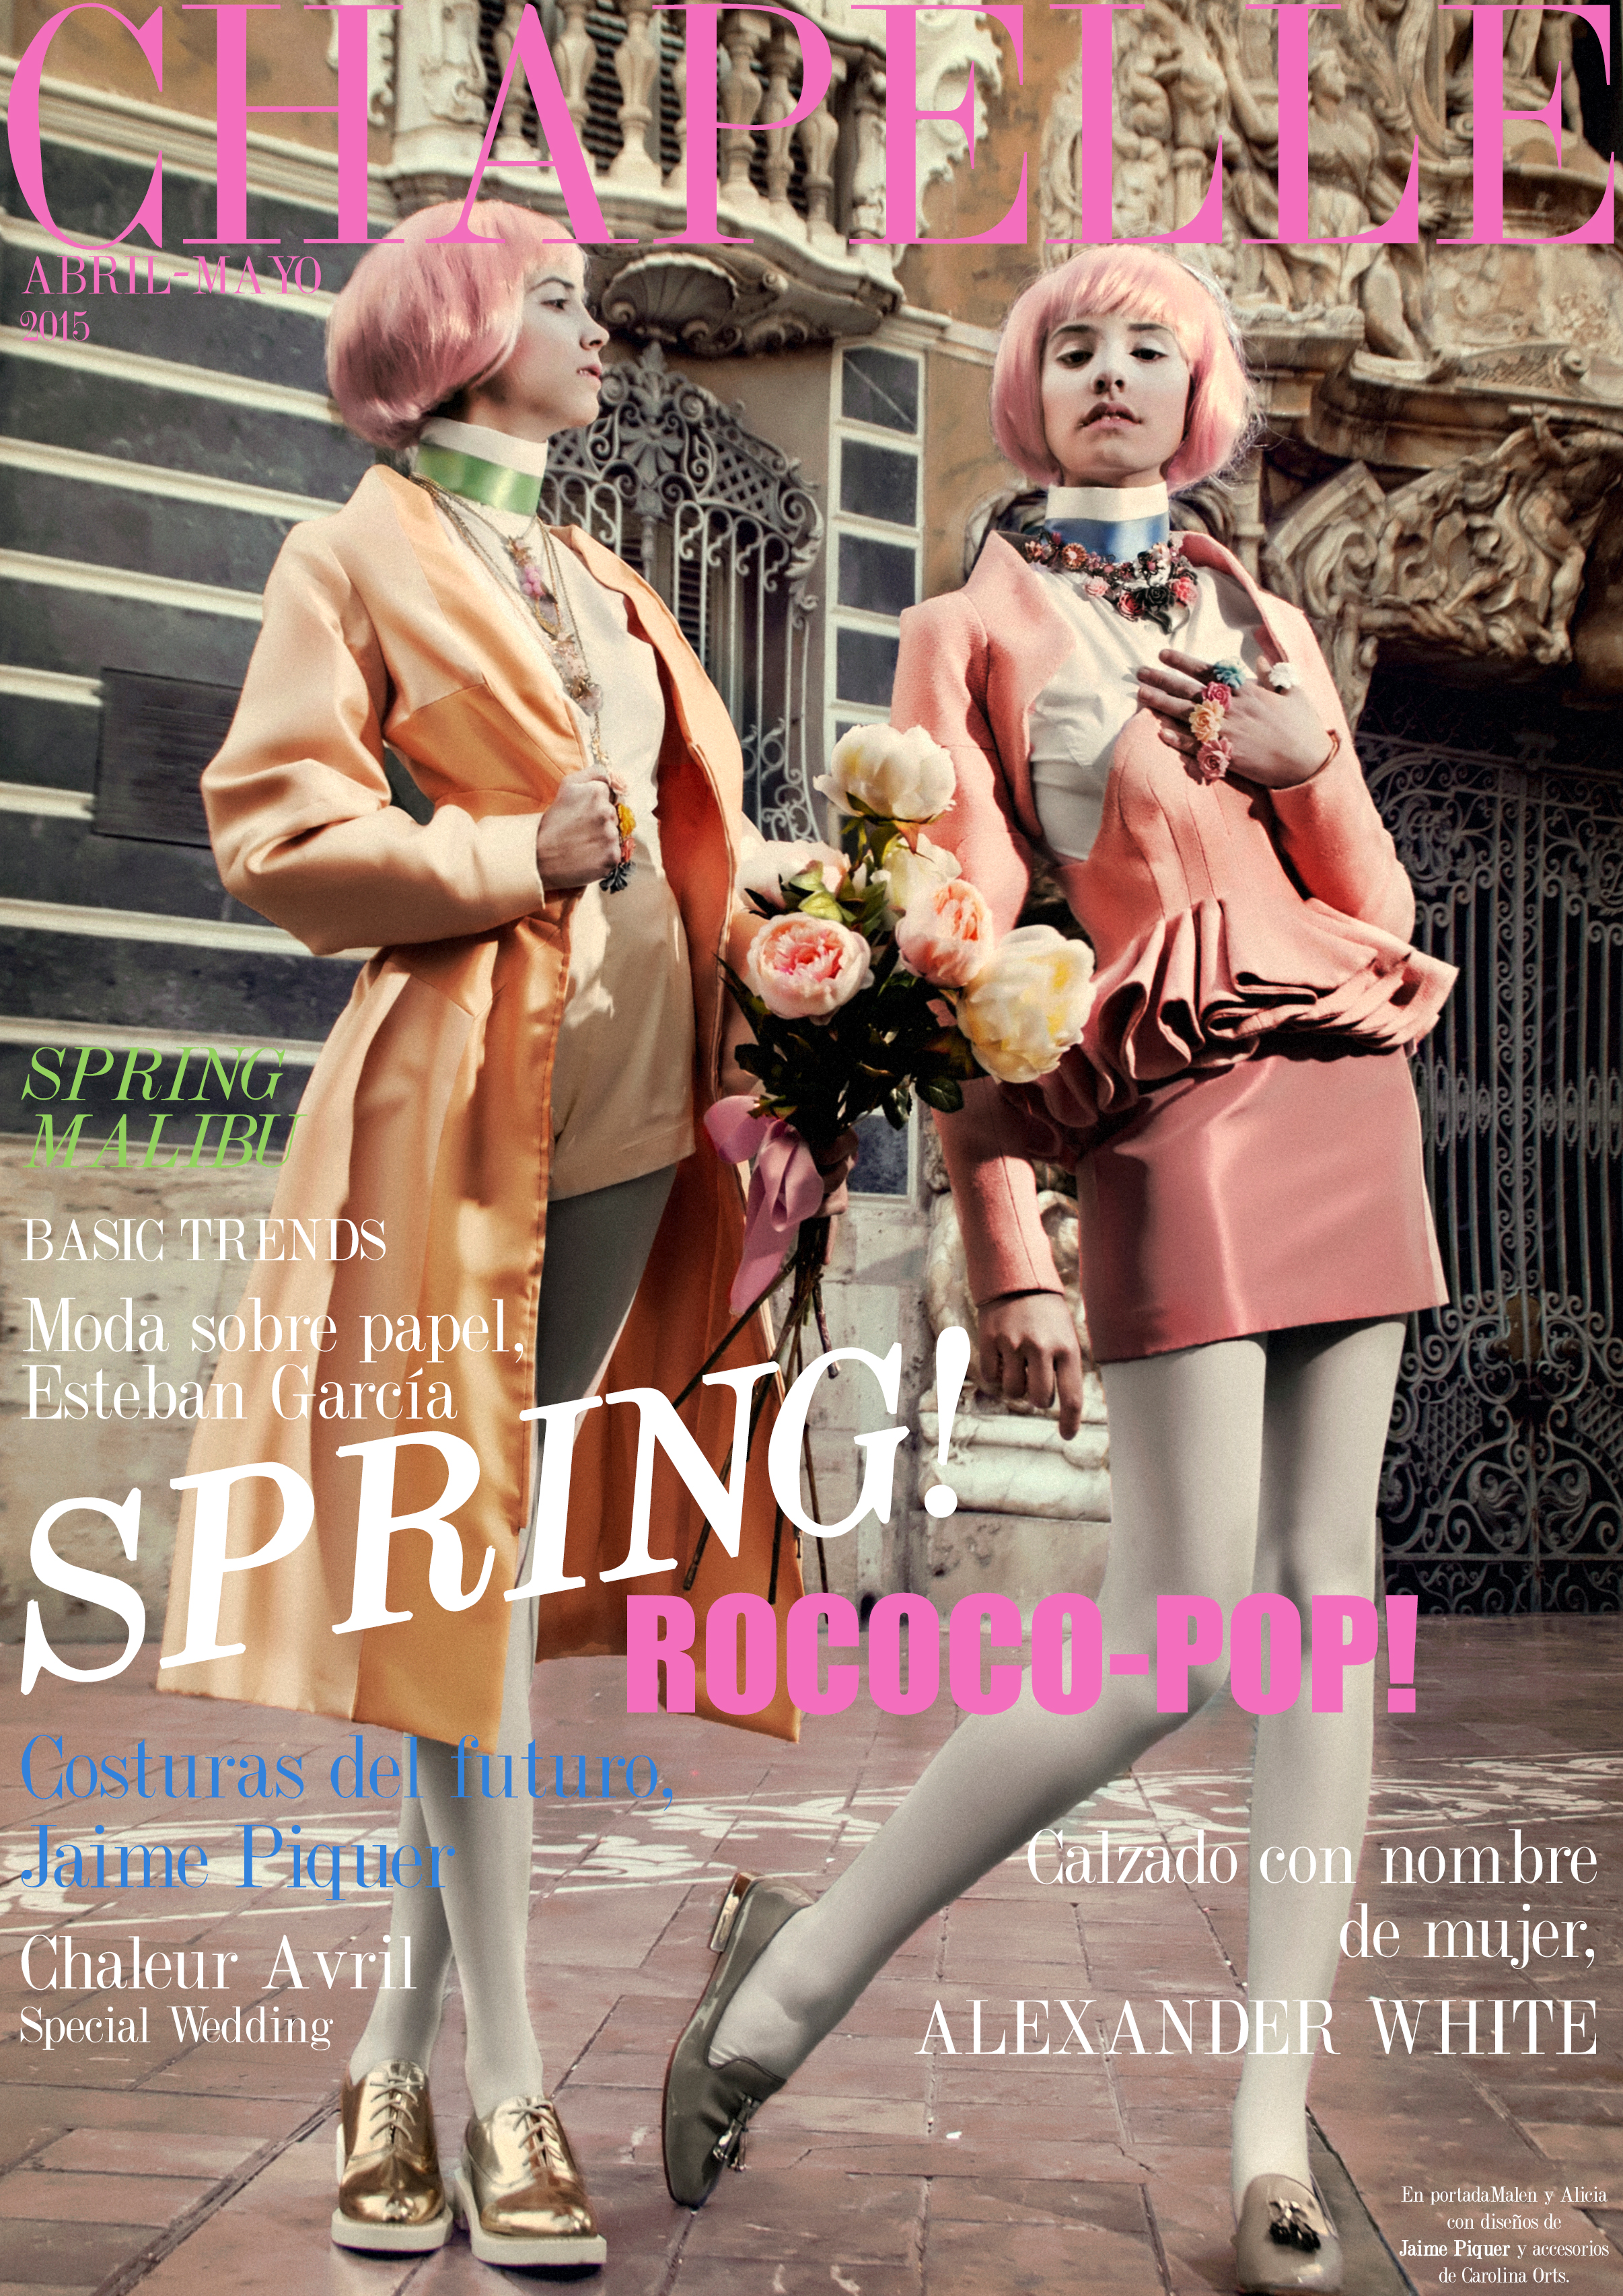 chapelle magazine fashion issue portadas, chapelle logo valencia revista moda estilo diseño, magazine rococo-pop cover front independent emerging bloggers designers spain